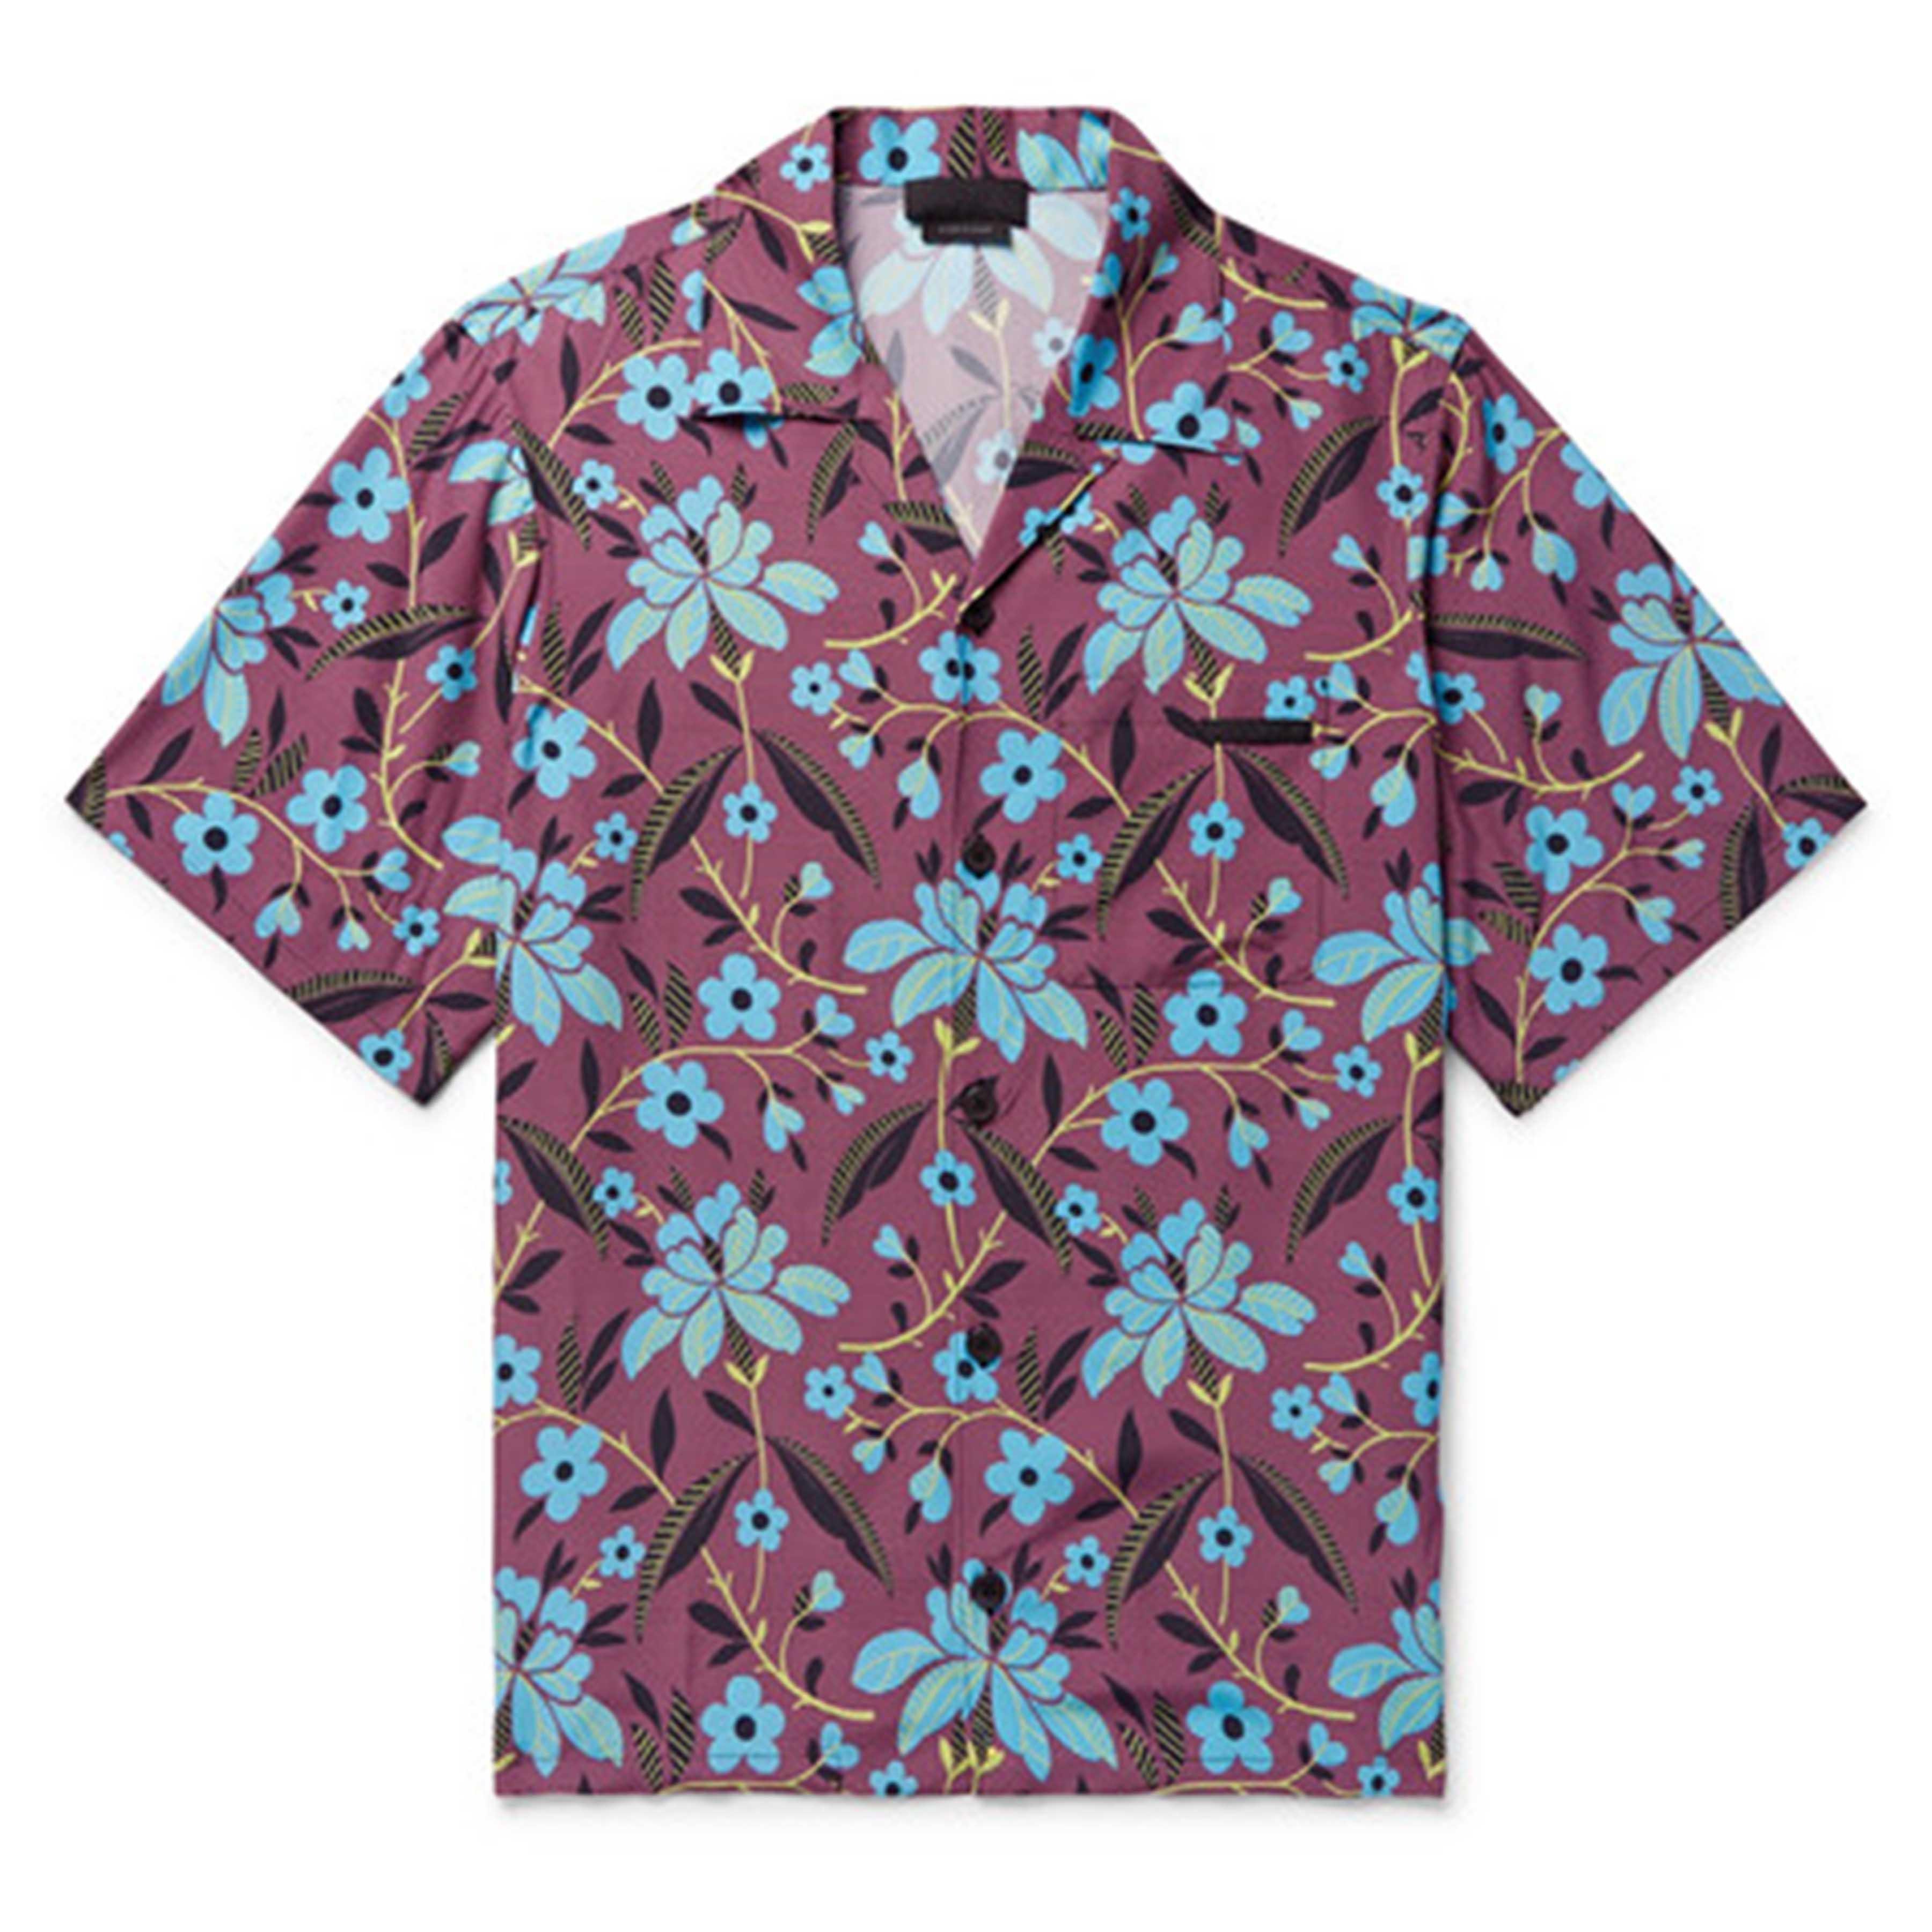 SS19 Printed Shirts: PRADA